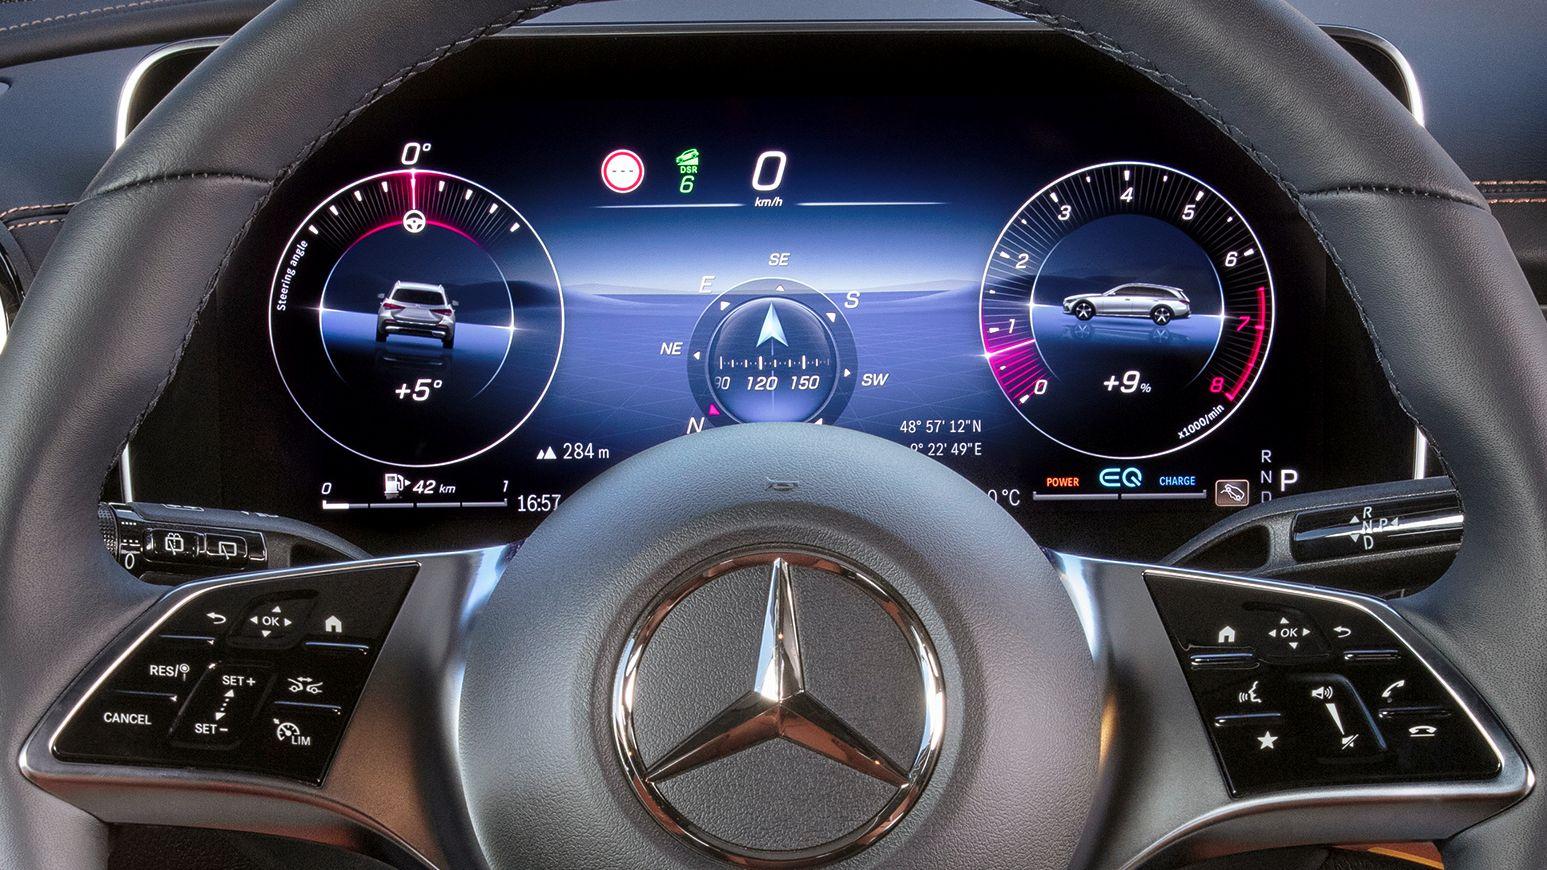 Mercedes C-Klasse T-Modell All-Terrain Offroad Tacho